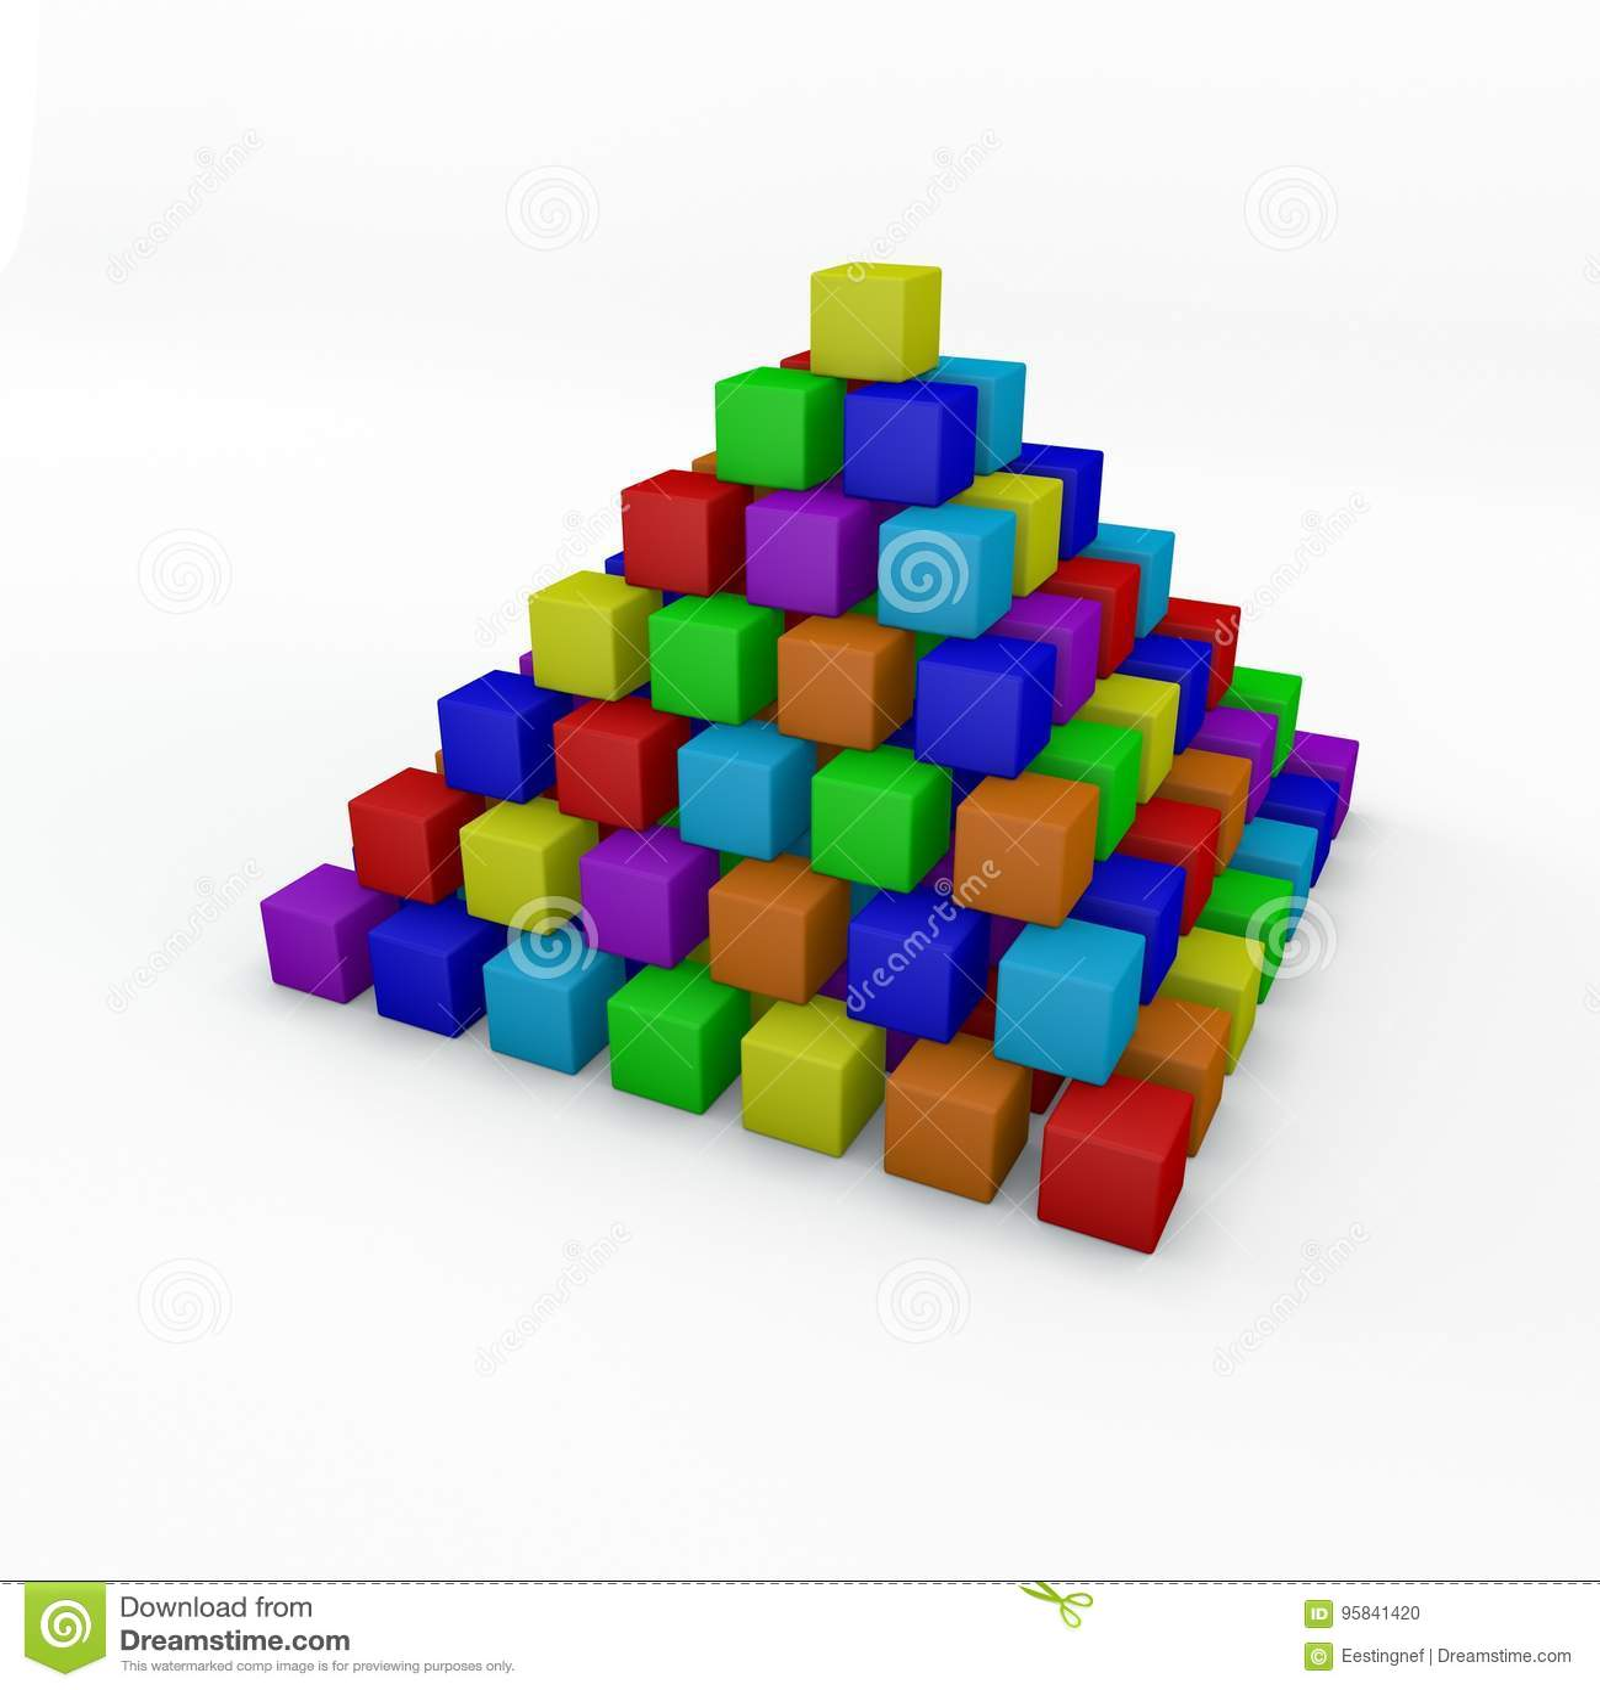 Pyramid From Toy Building Blocks  3D Rendering Illustration